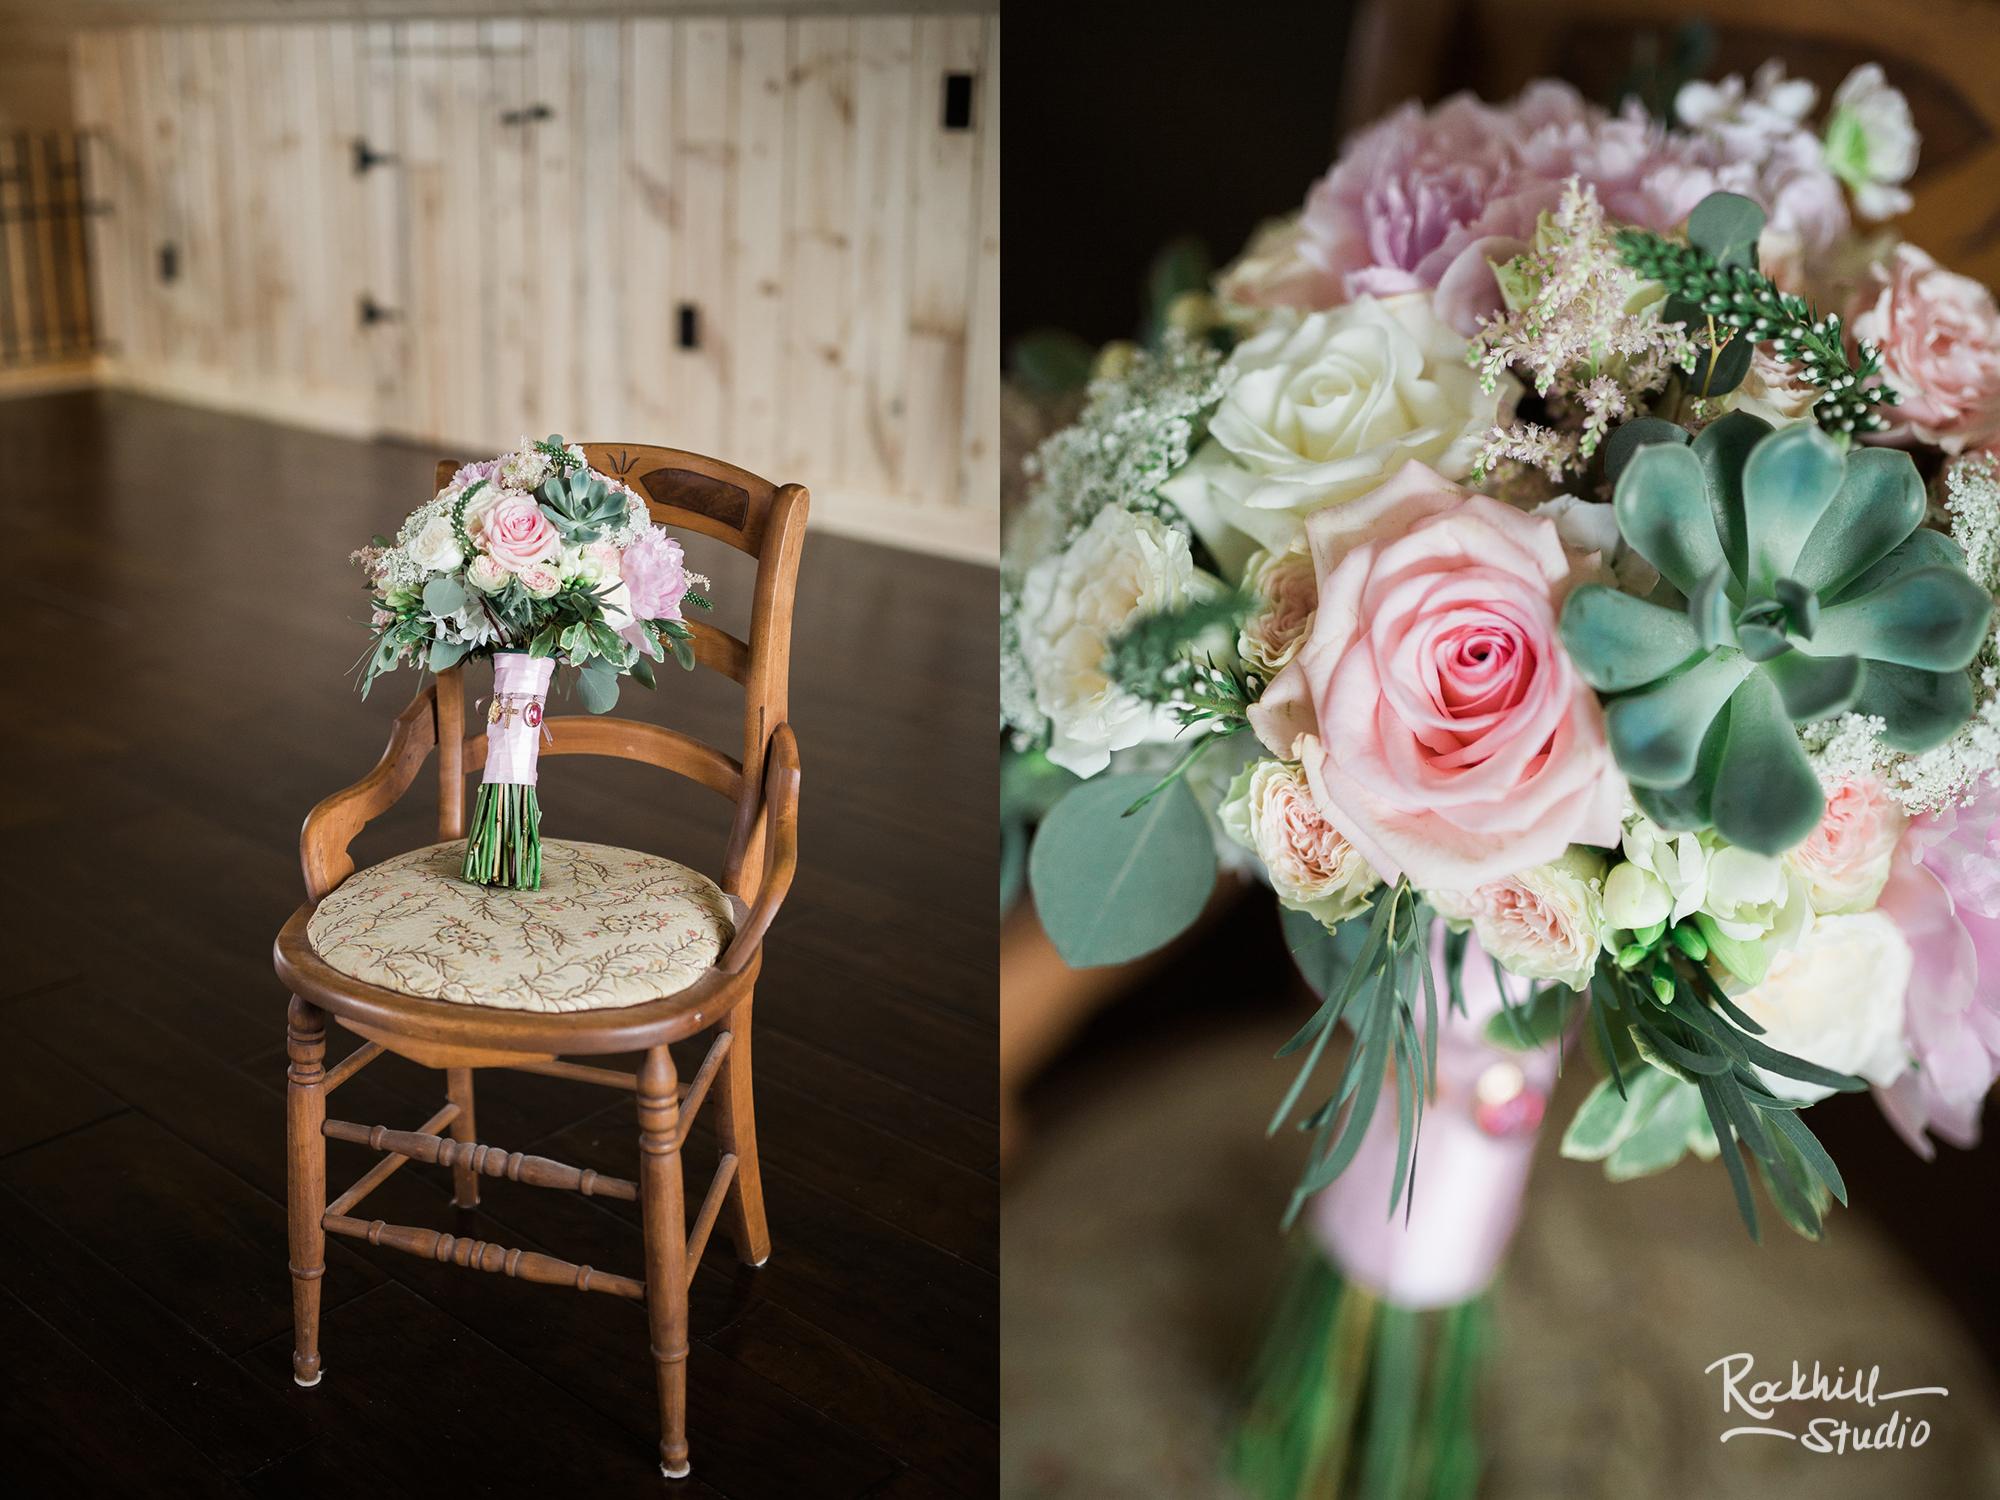 newberry-michigan-wedding-upper-peninsula-spring-photography-rockhill-ee-13.jpg